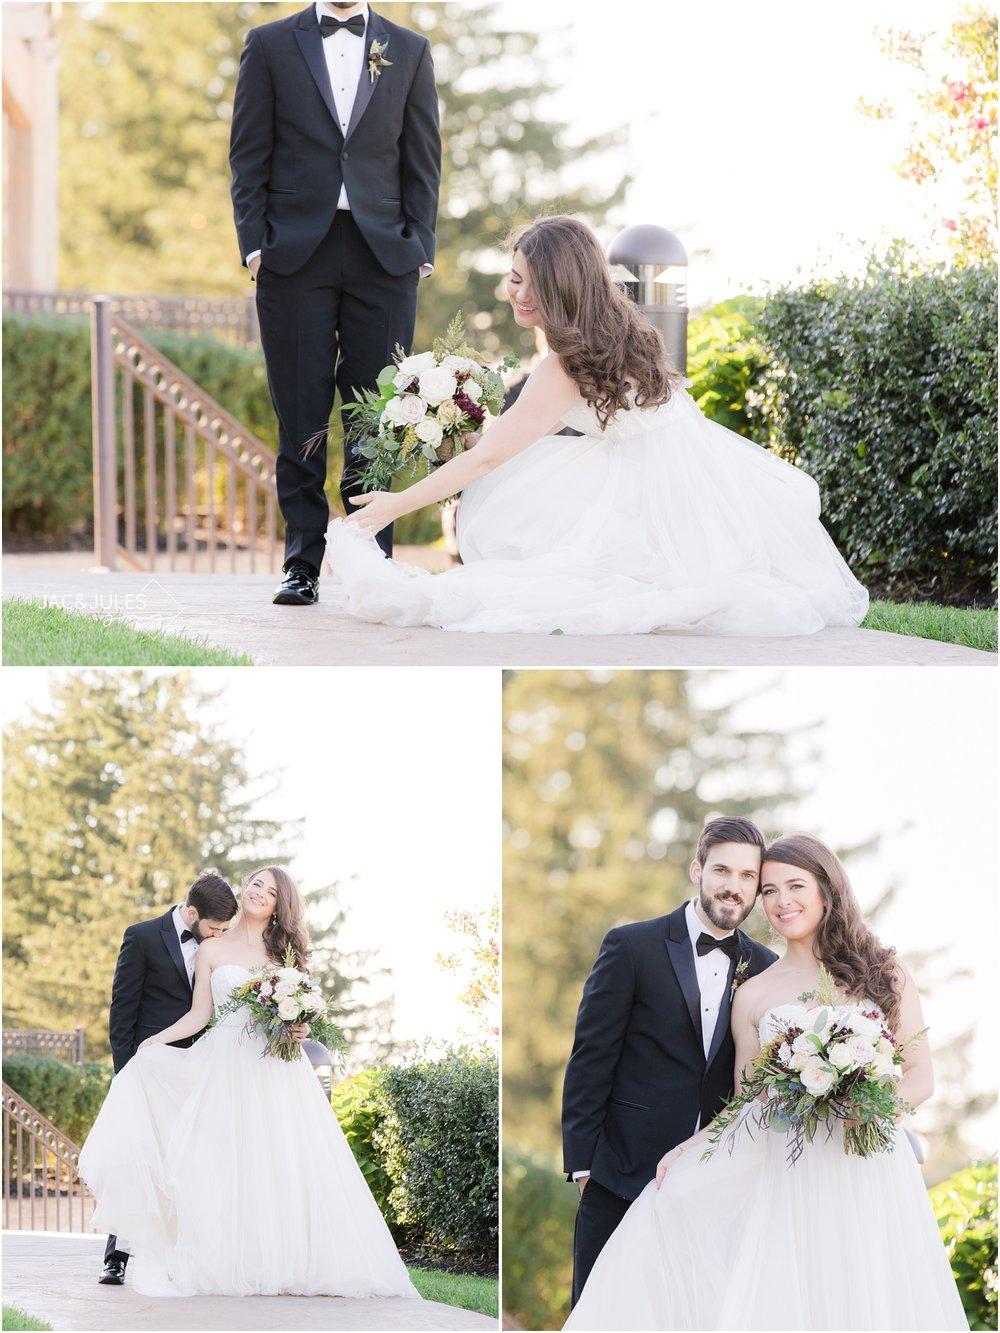 wedding photos at Laurita Winery.